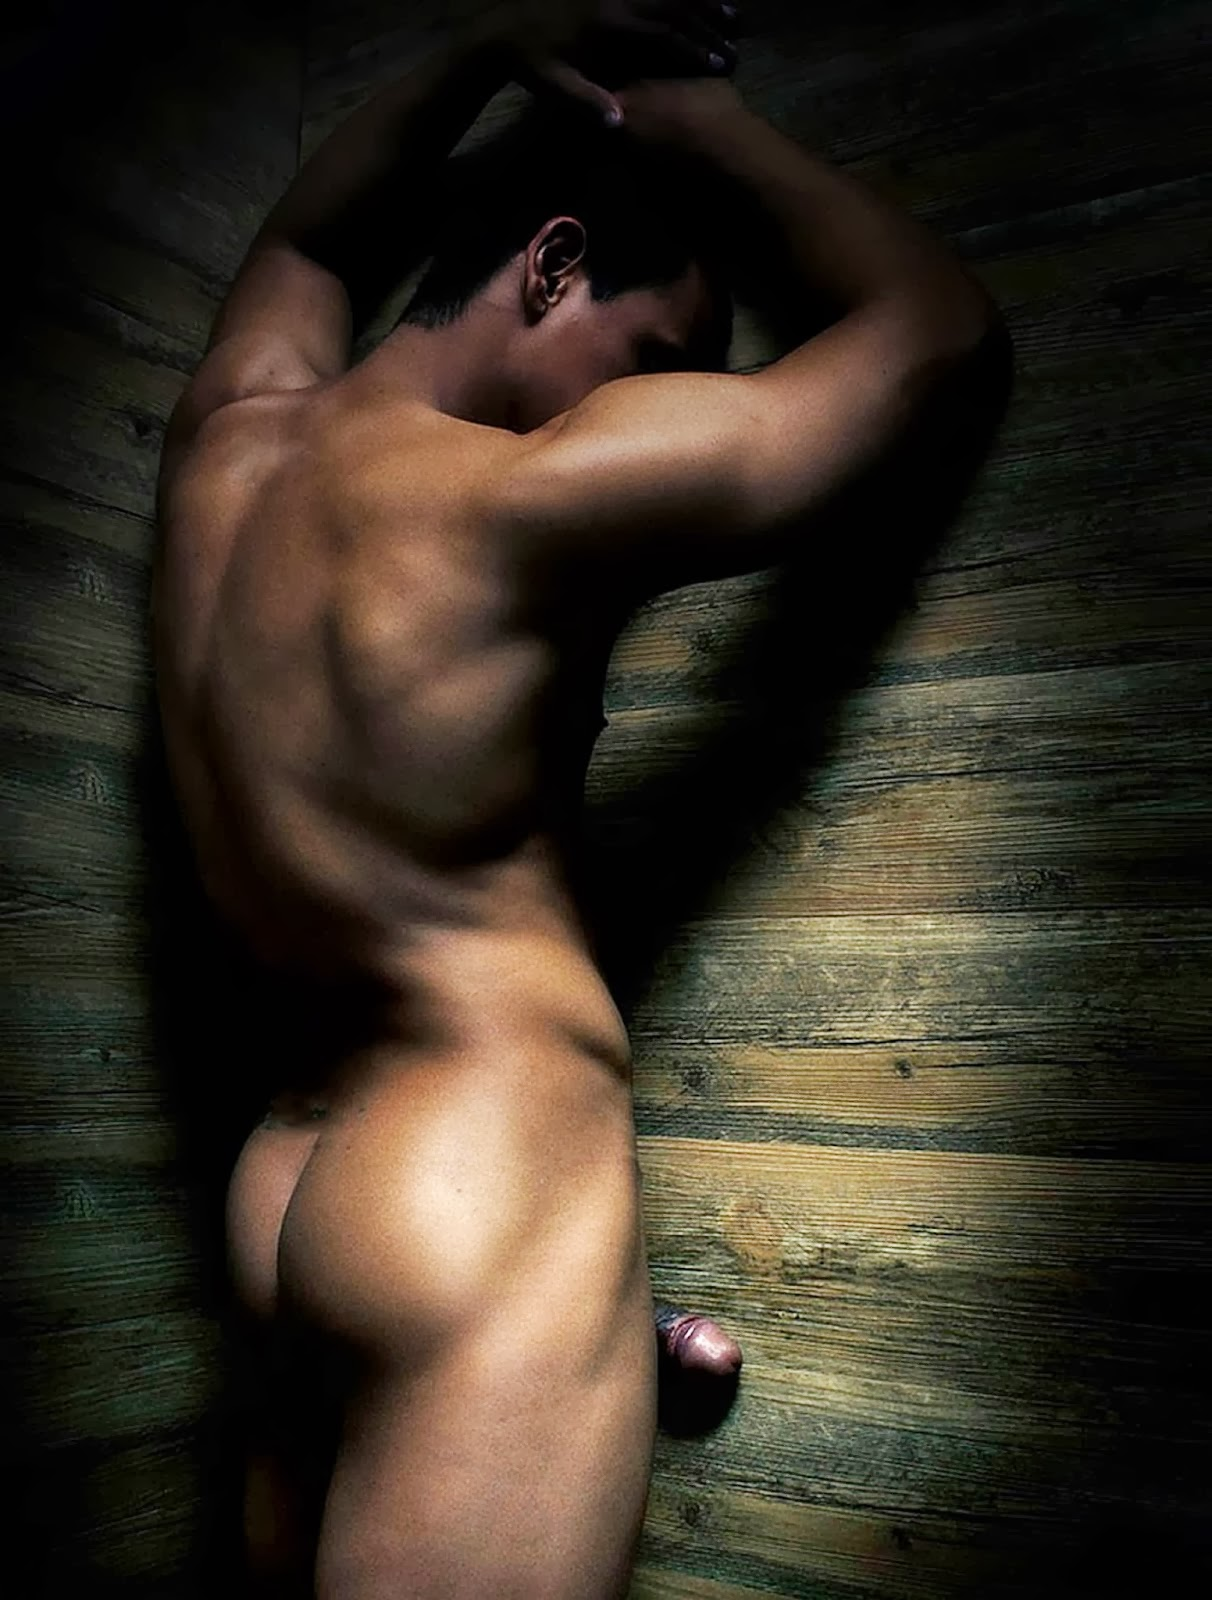 Erotic male videos